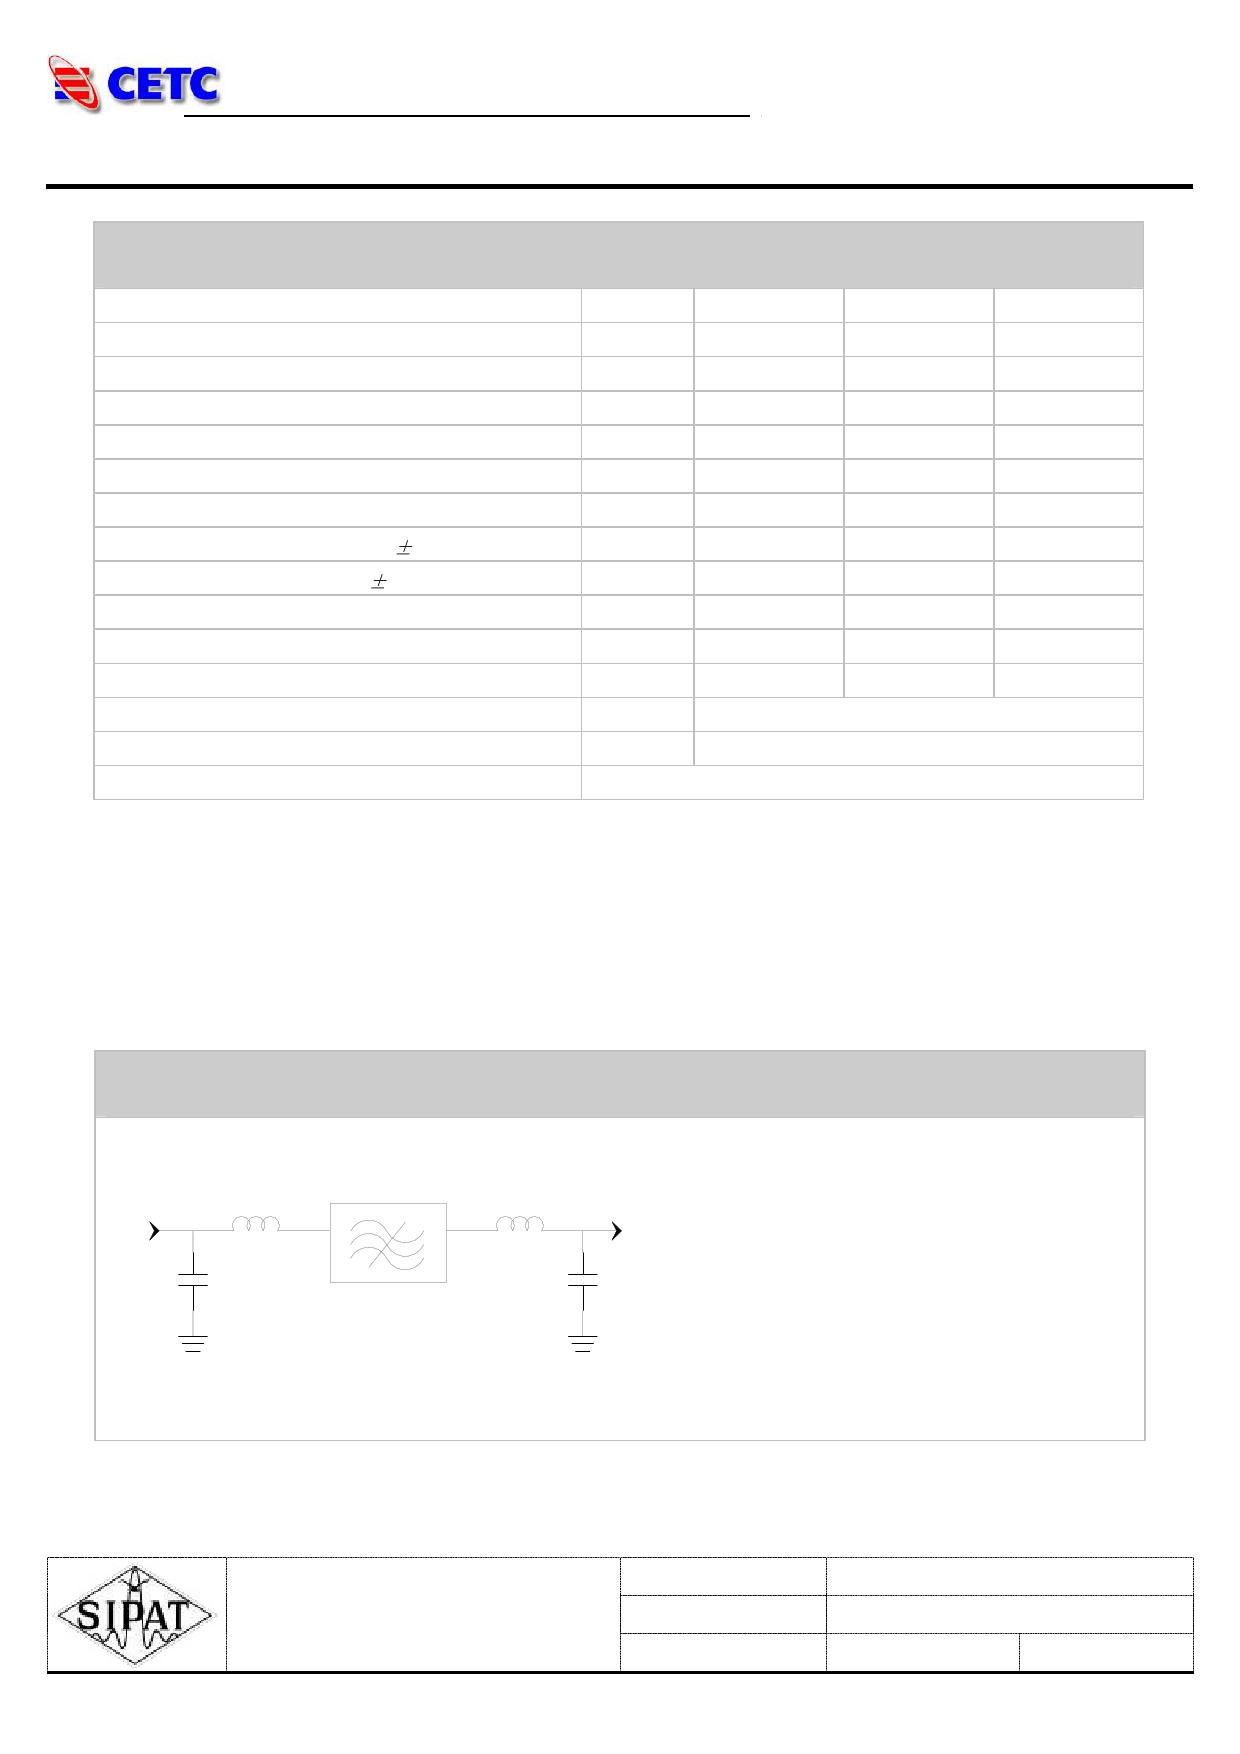 LBT14066 datasheet